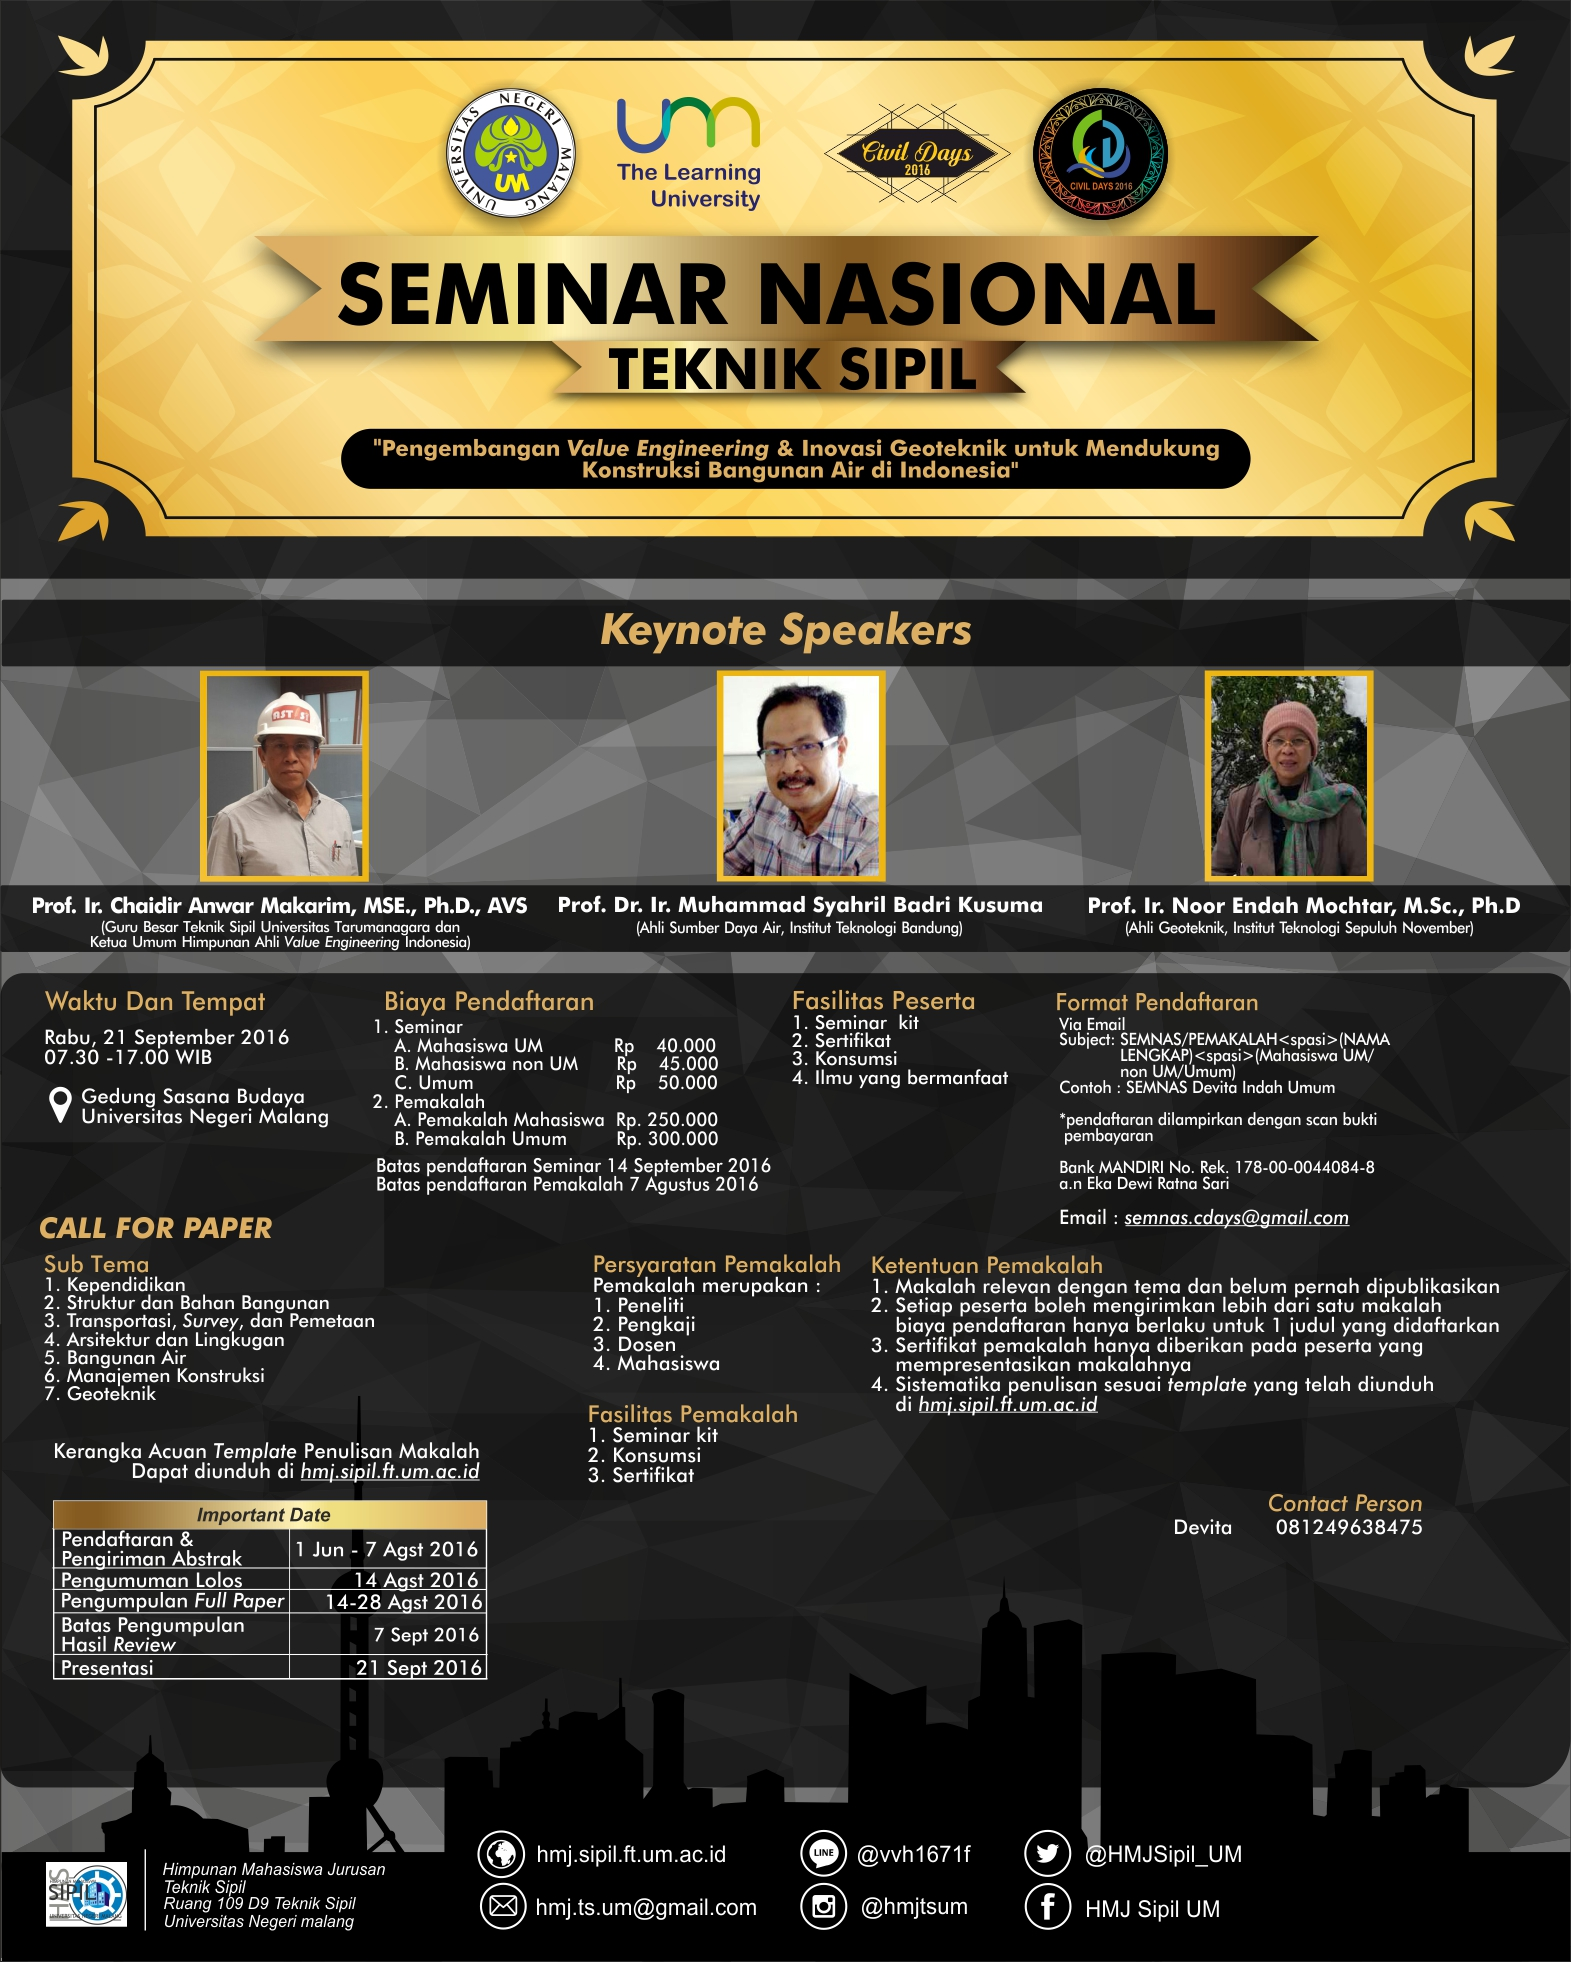 Pamflet Seminar Nasional